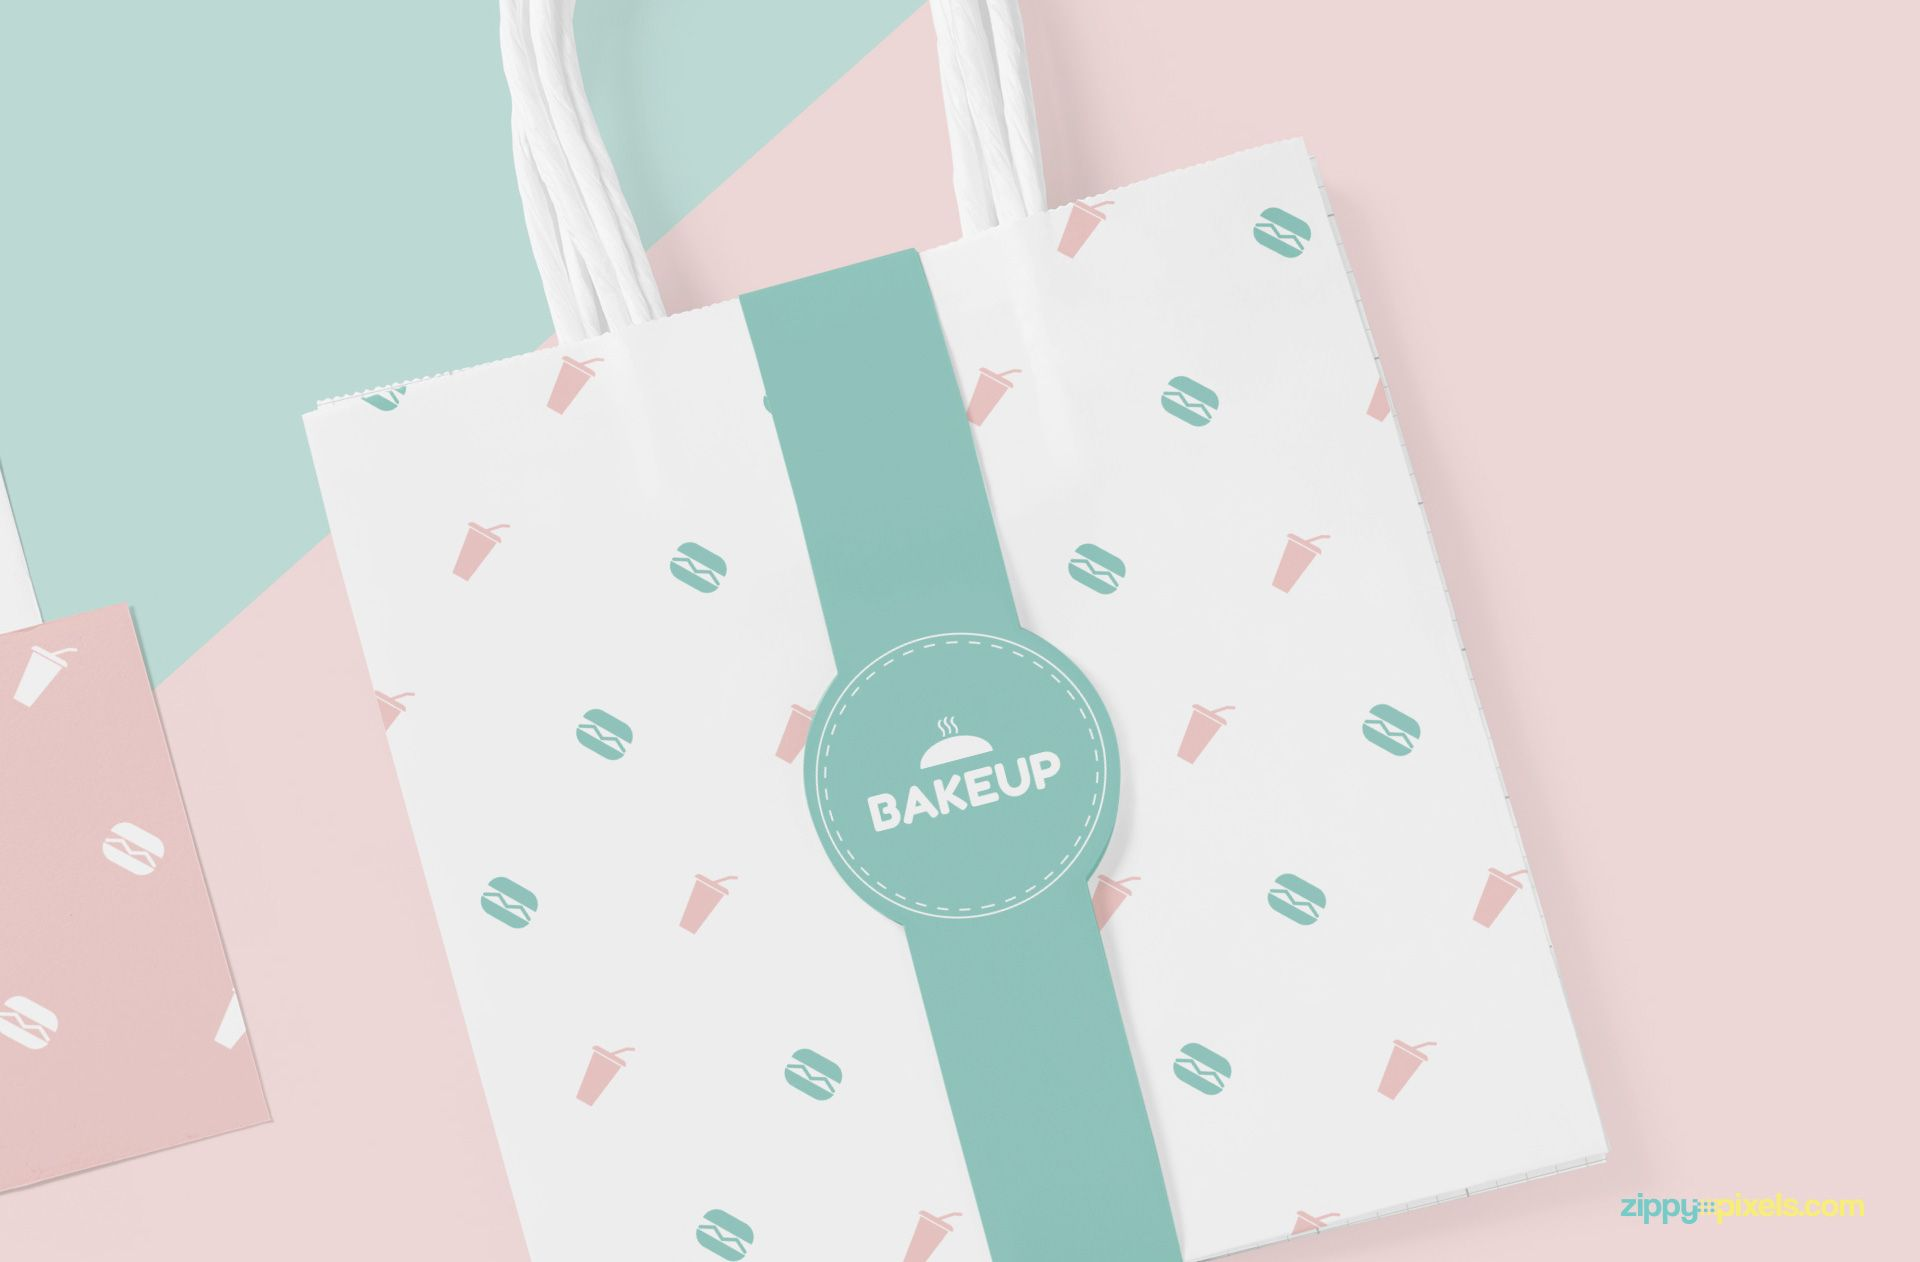 Download Free Tote Bag Mockup Psd Zippypixels Tote Bag Bag Mockup Free Tote